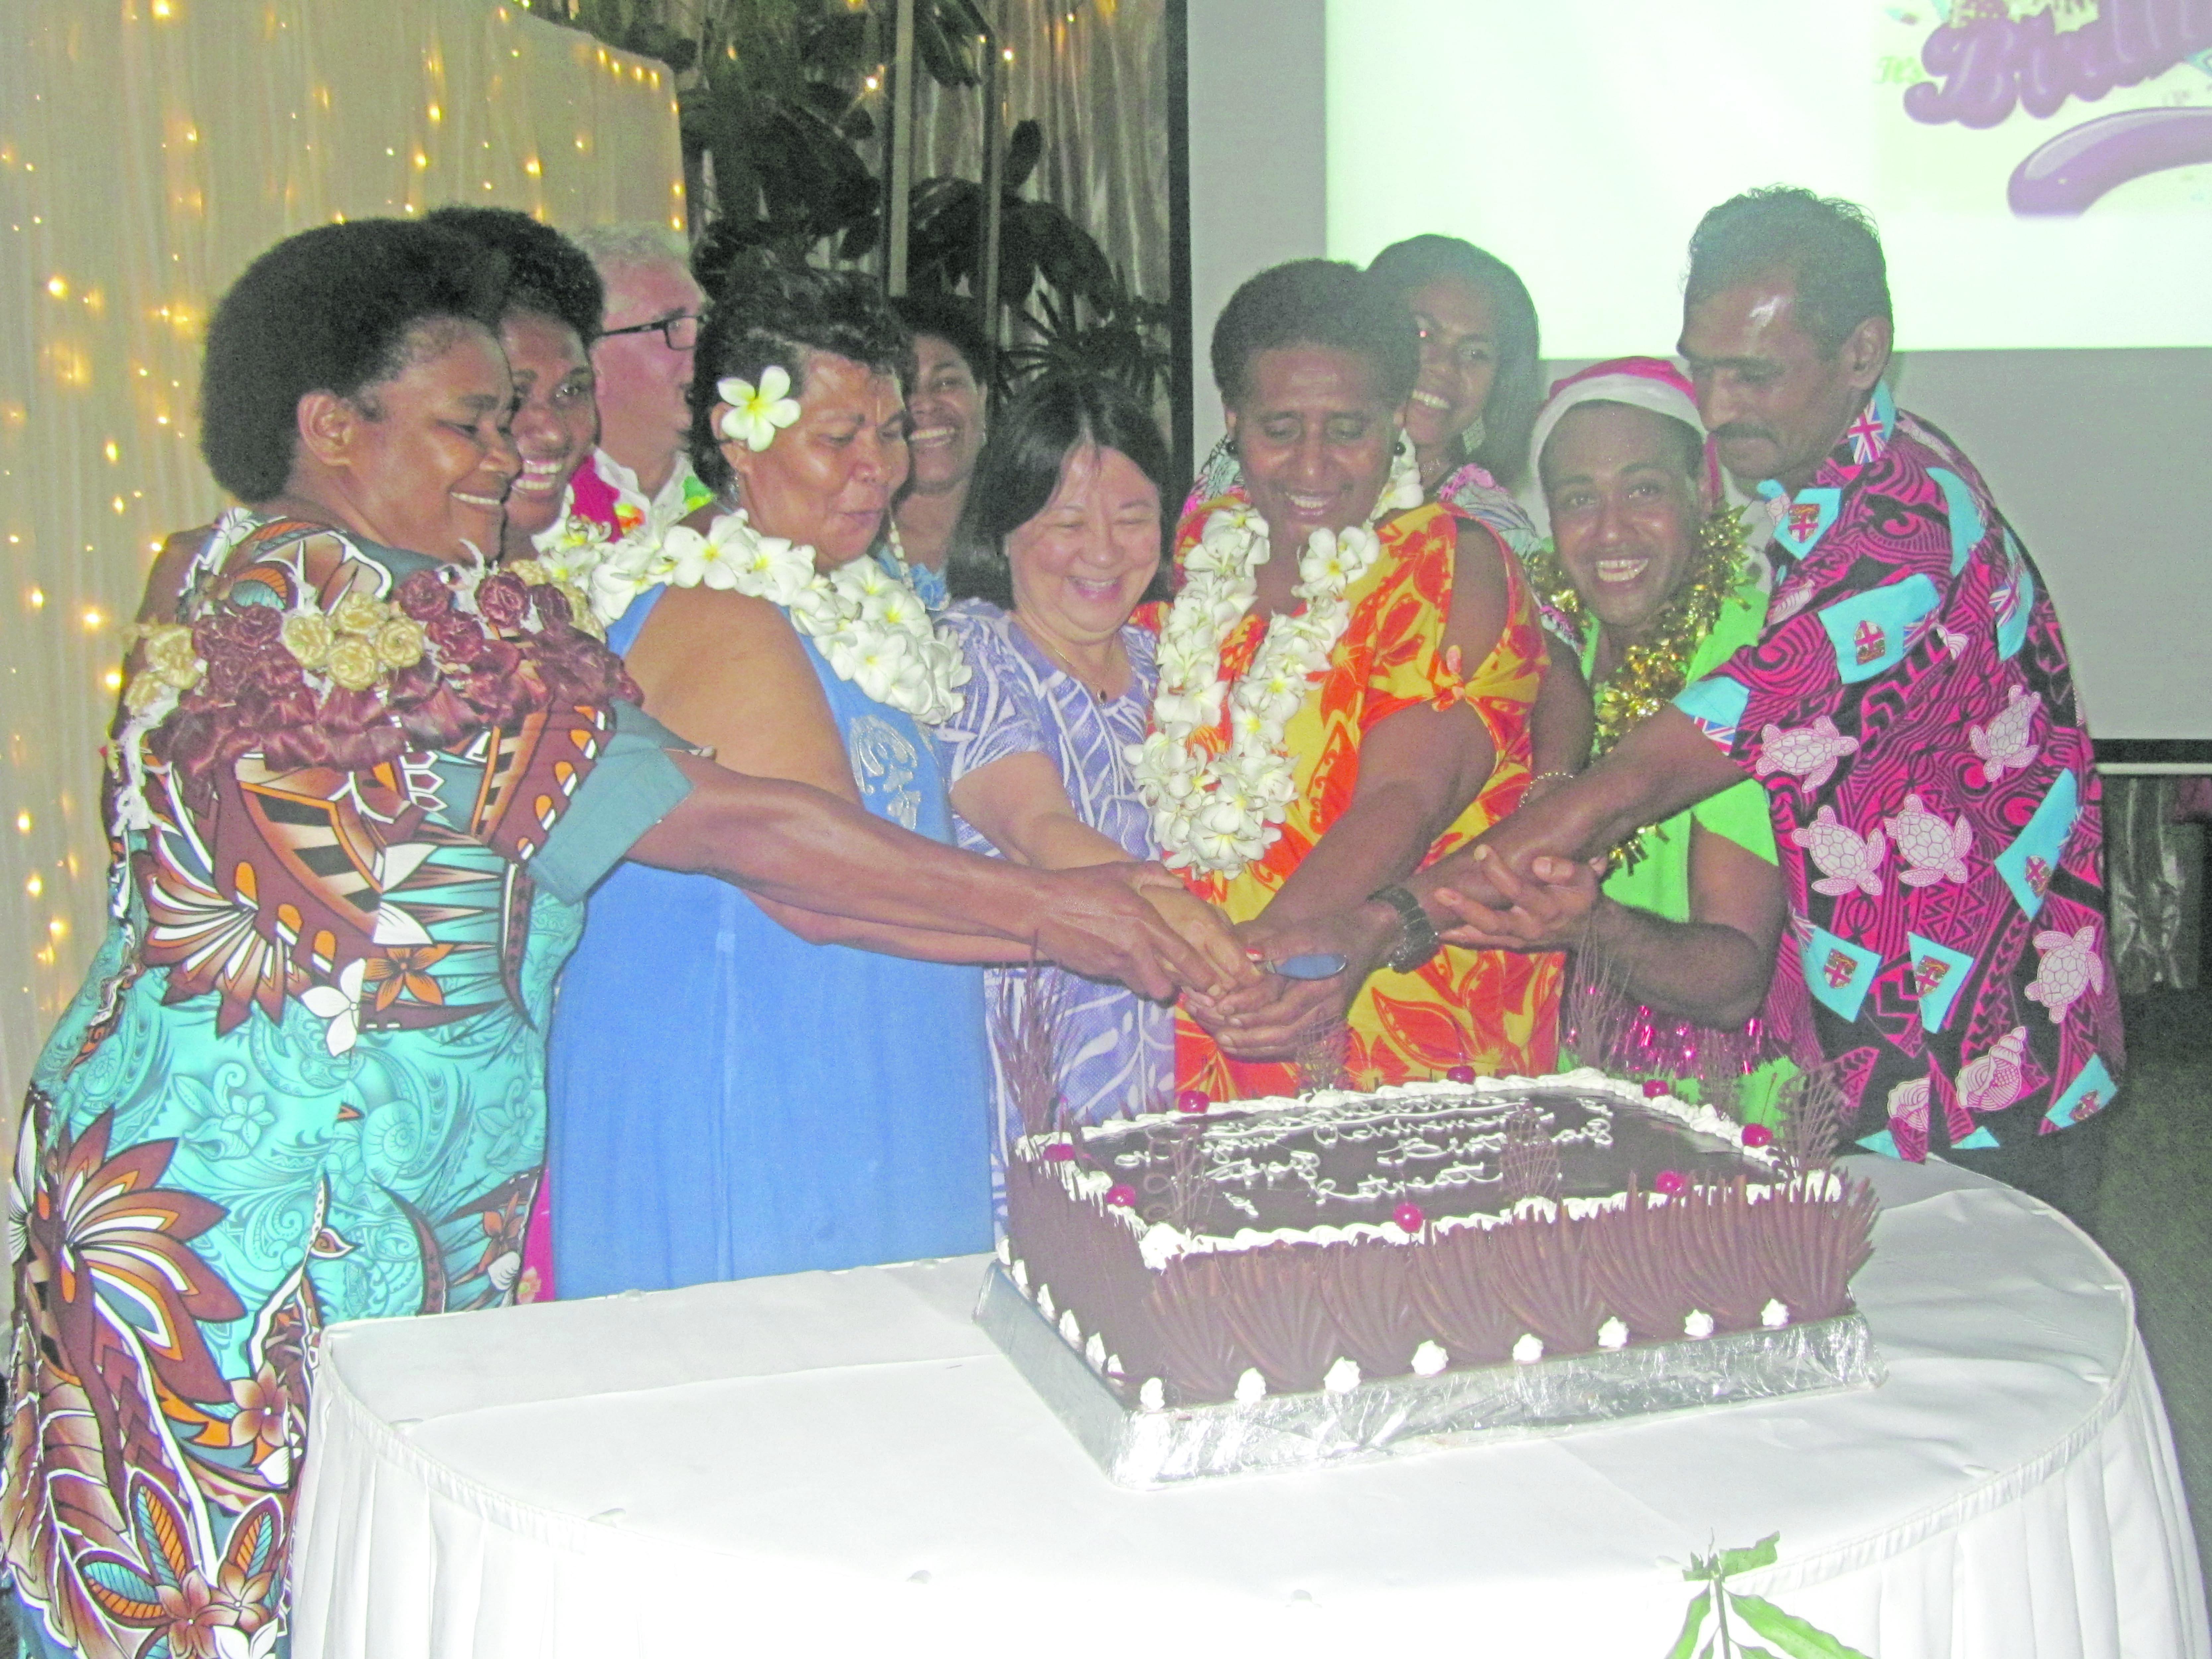 Warwick Fiji staff cut the cake during the resort's annual staff award night .  Photo: Warwick Fiji